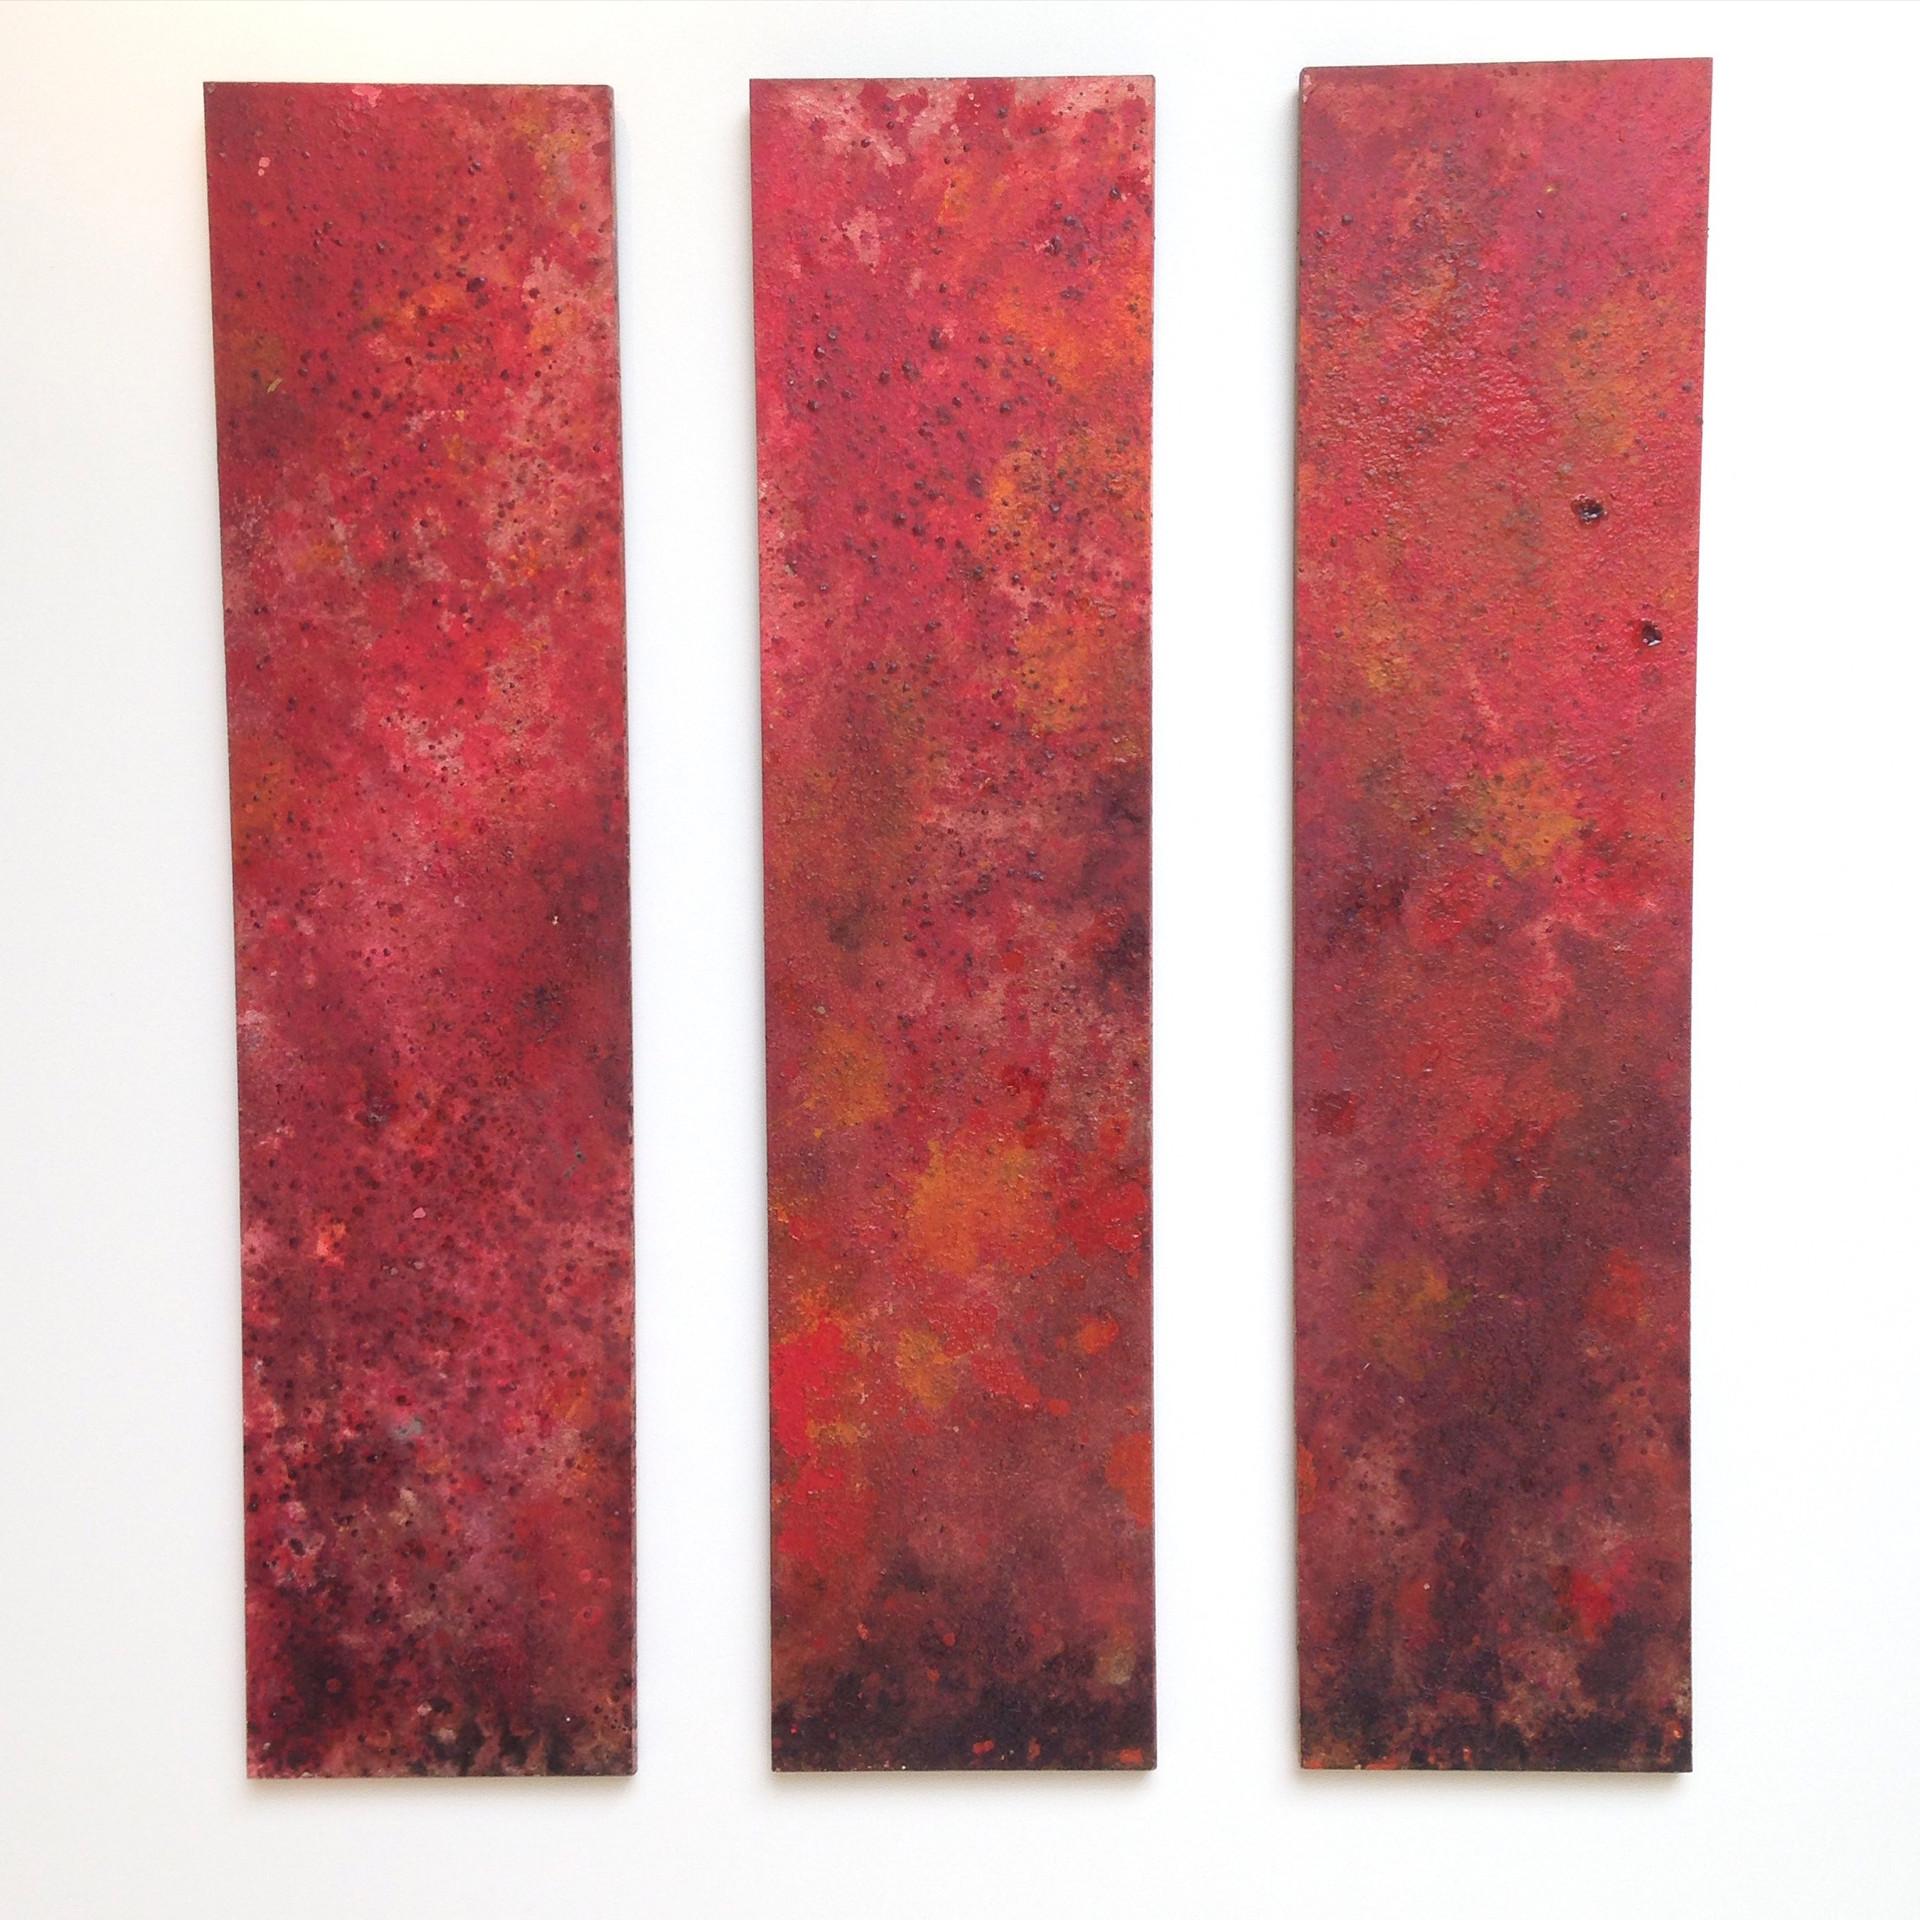 "2013 Wood Panel Series of 6 48"" x 12"" x 1"" each  Cambridge, Massachusetts 2013  Available $700"